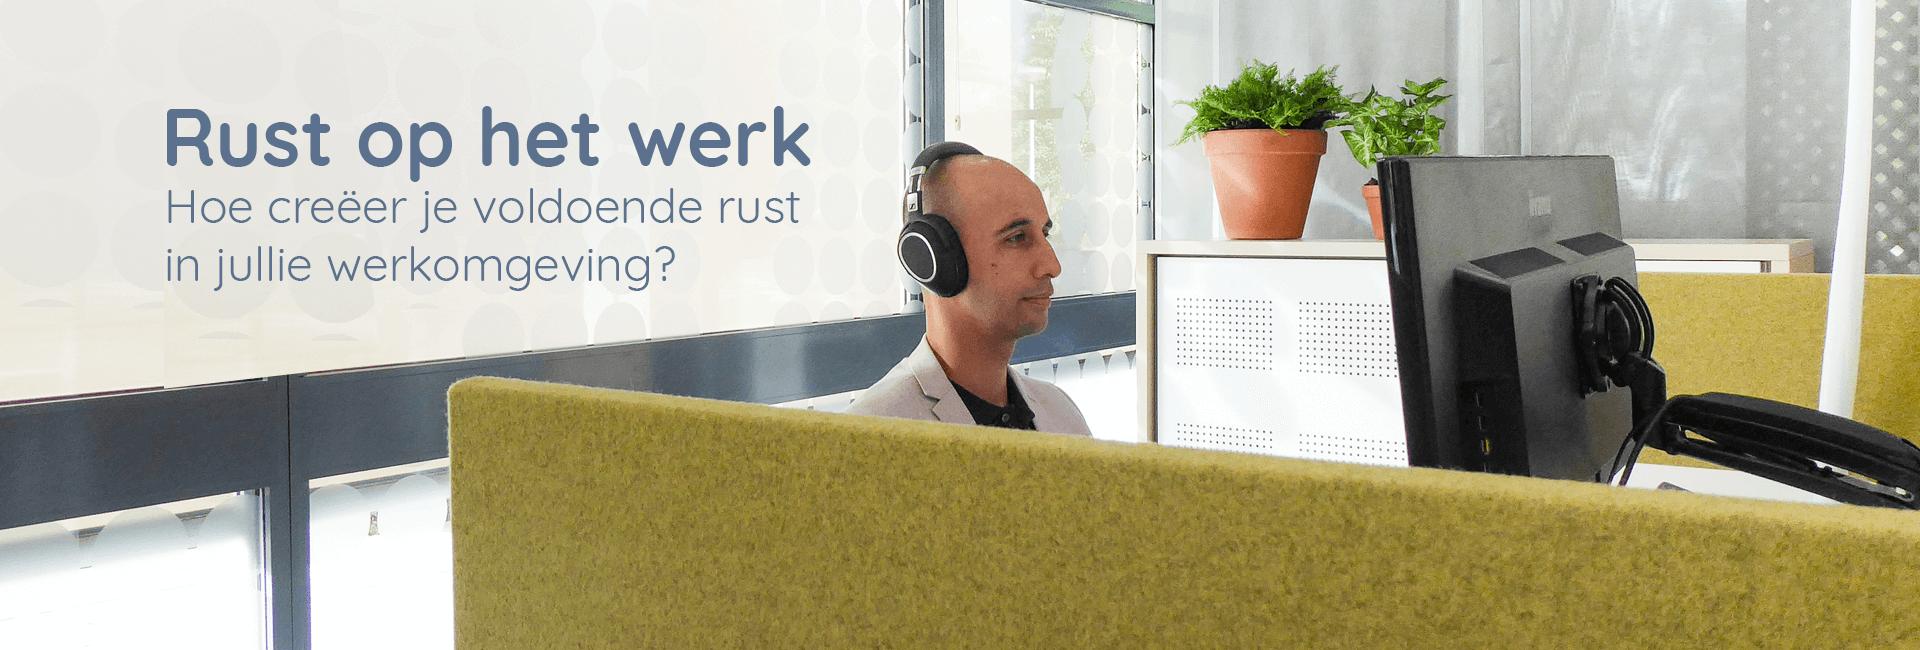 Projectinrichting - Rust